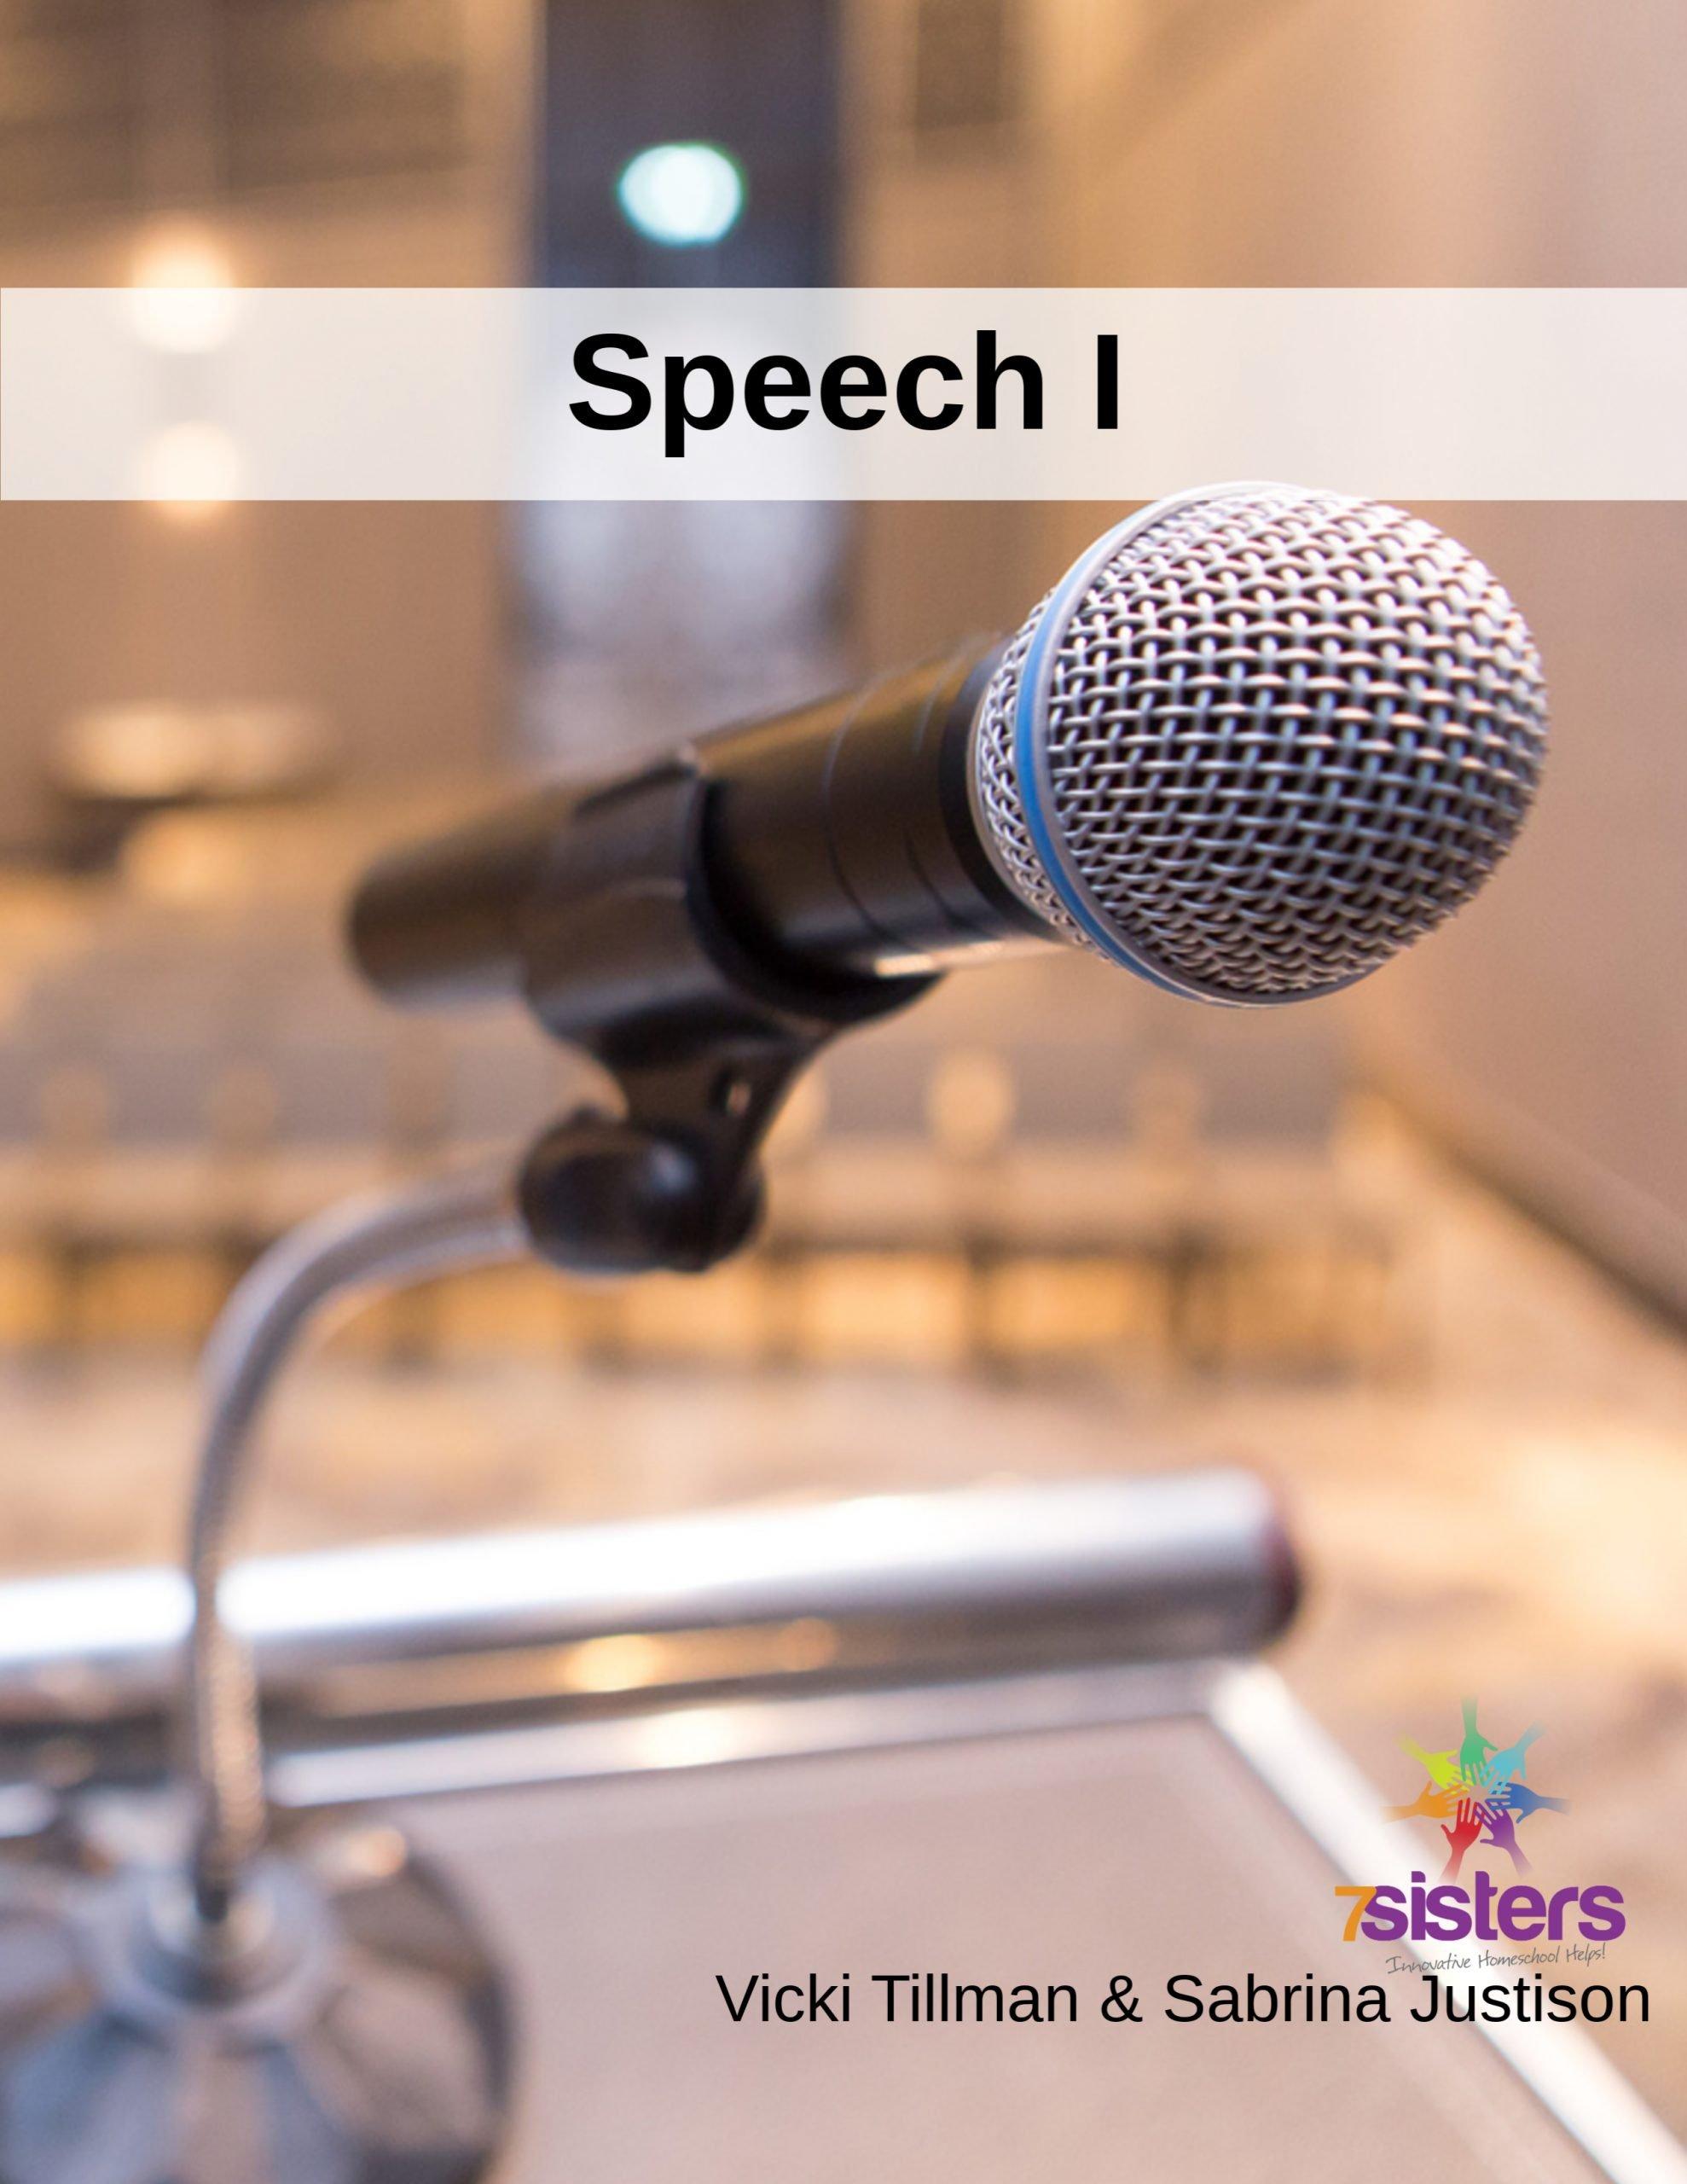 Speech I Public Speaking and Practical Life Skills